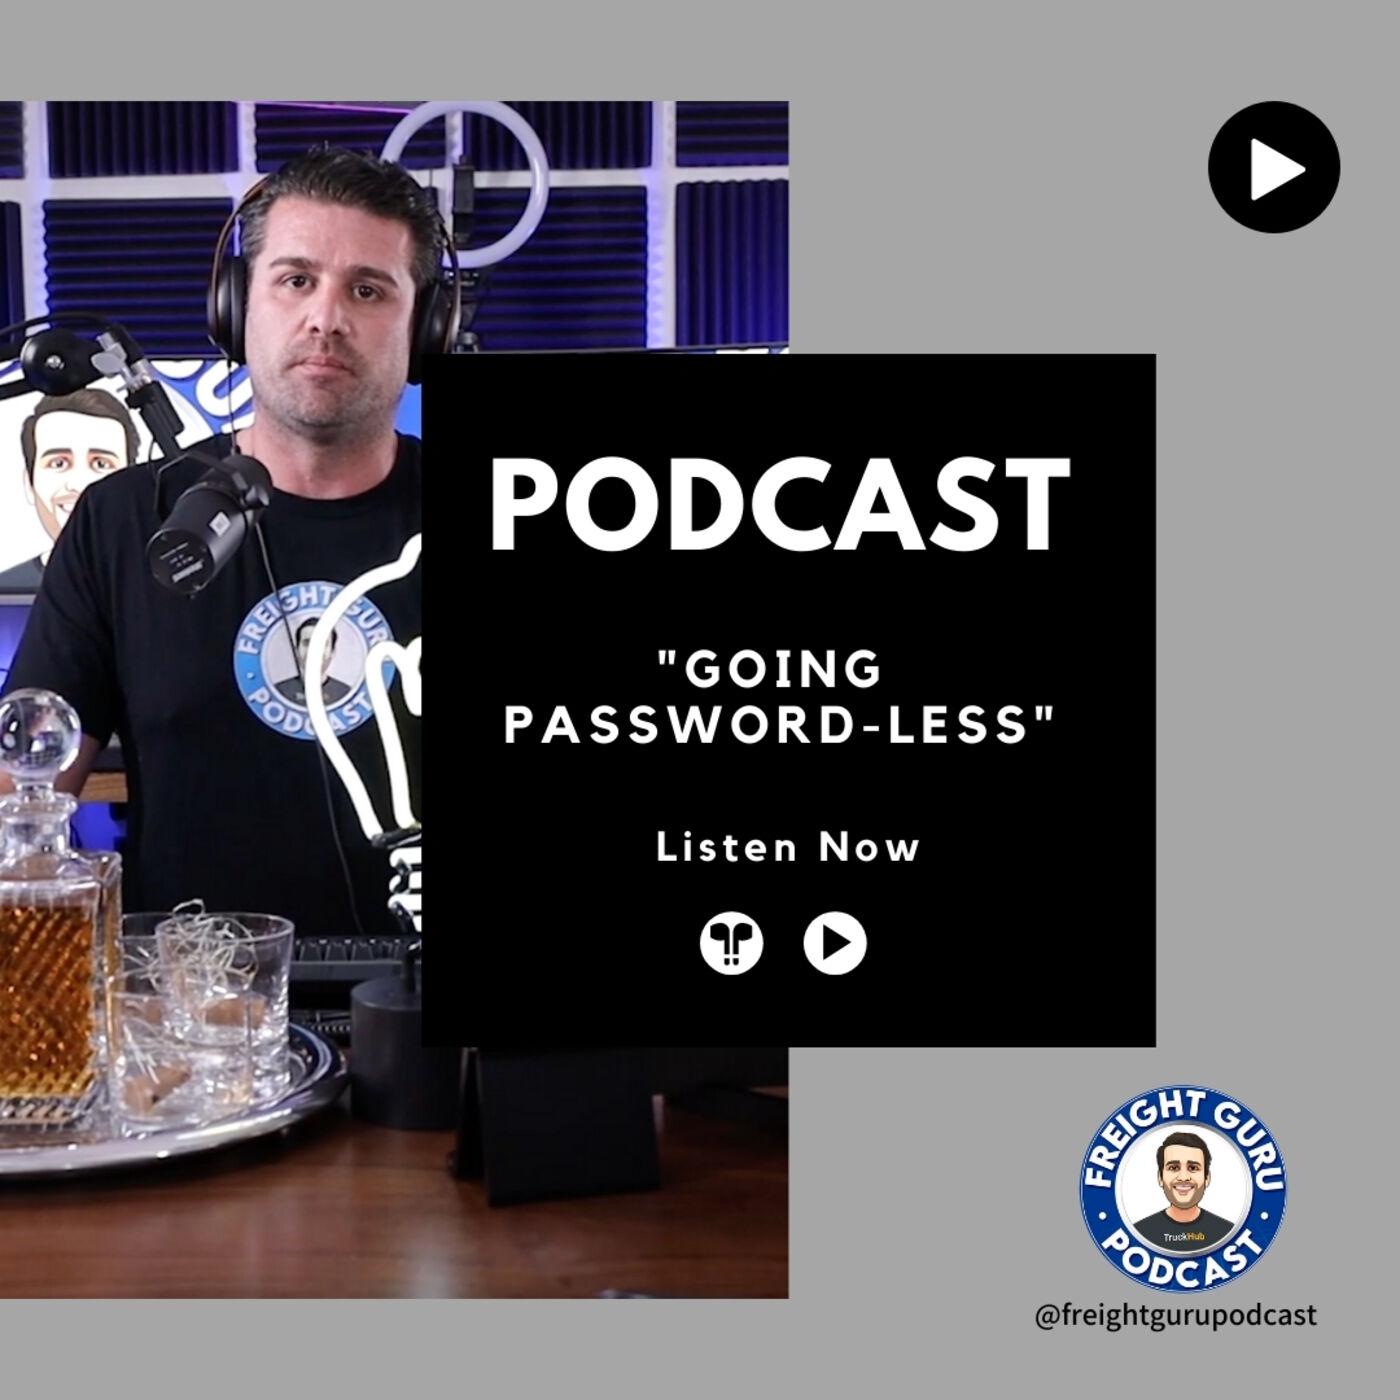 Trucking Companies are Going Passwordless - Freight Guru Podcast Ep. 12